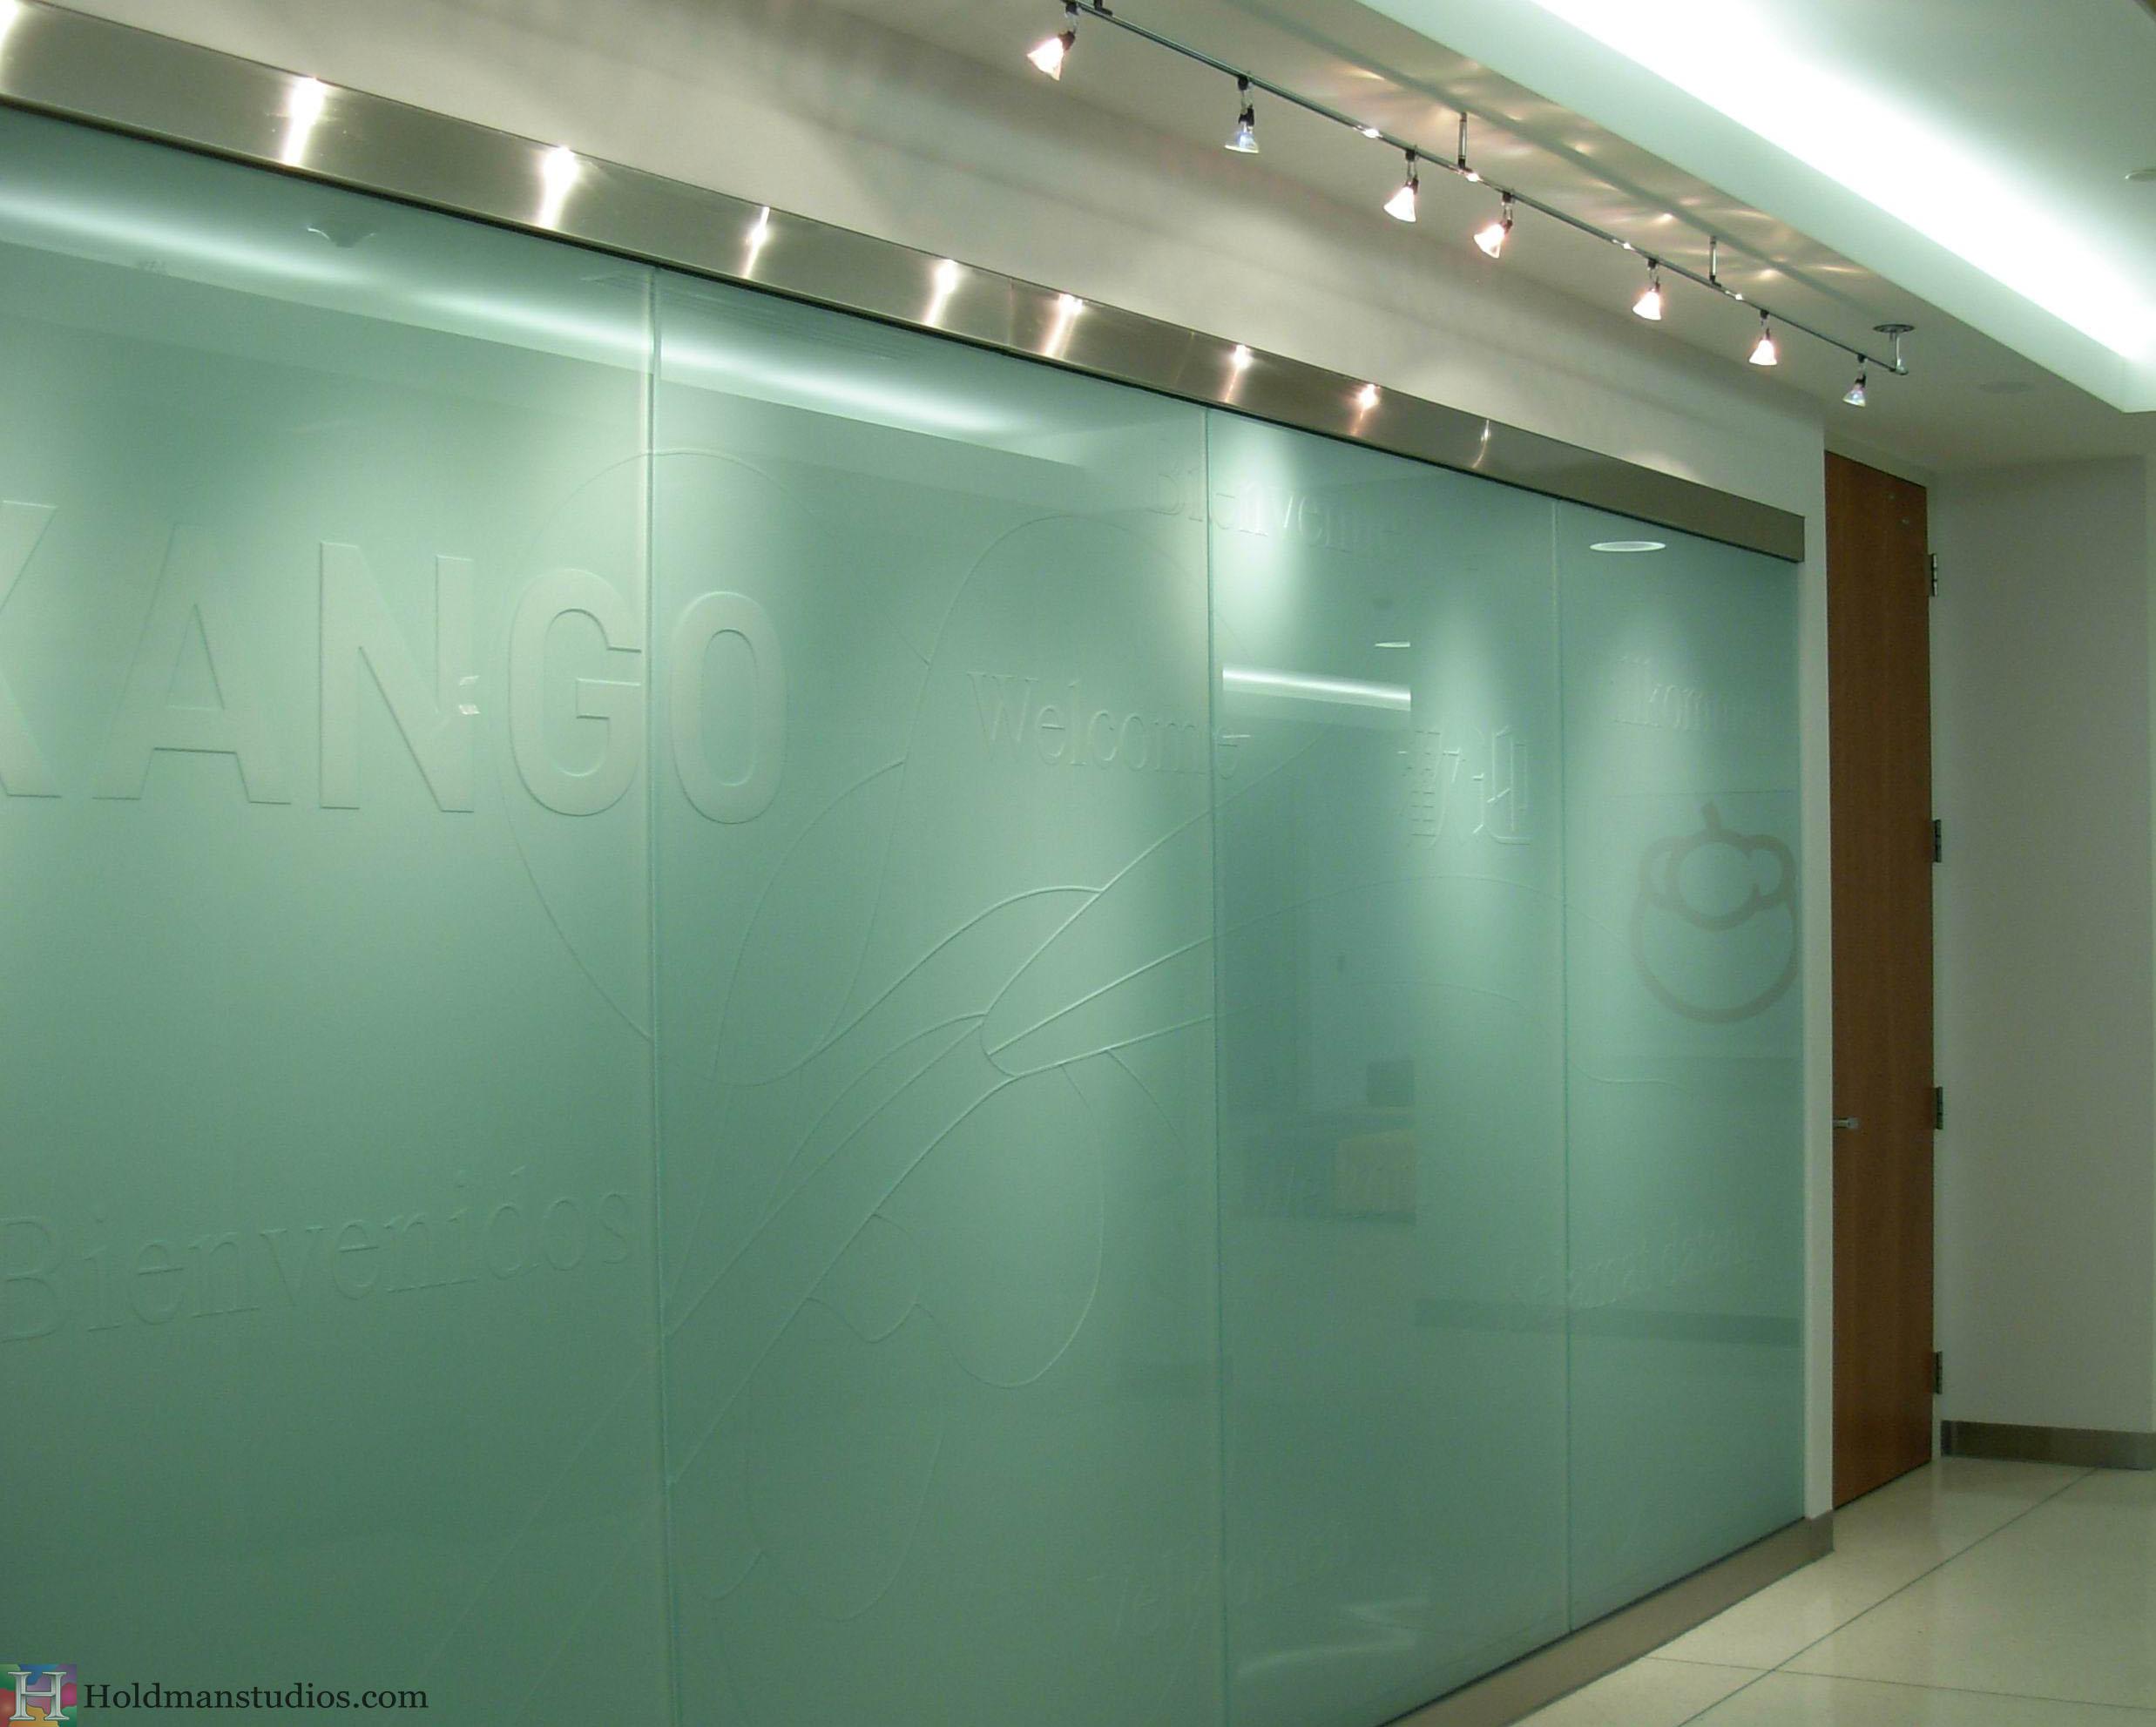 Art glass_Xango glass wall.jpg